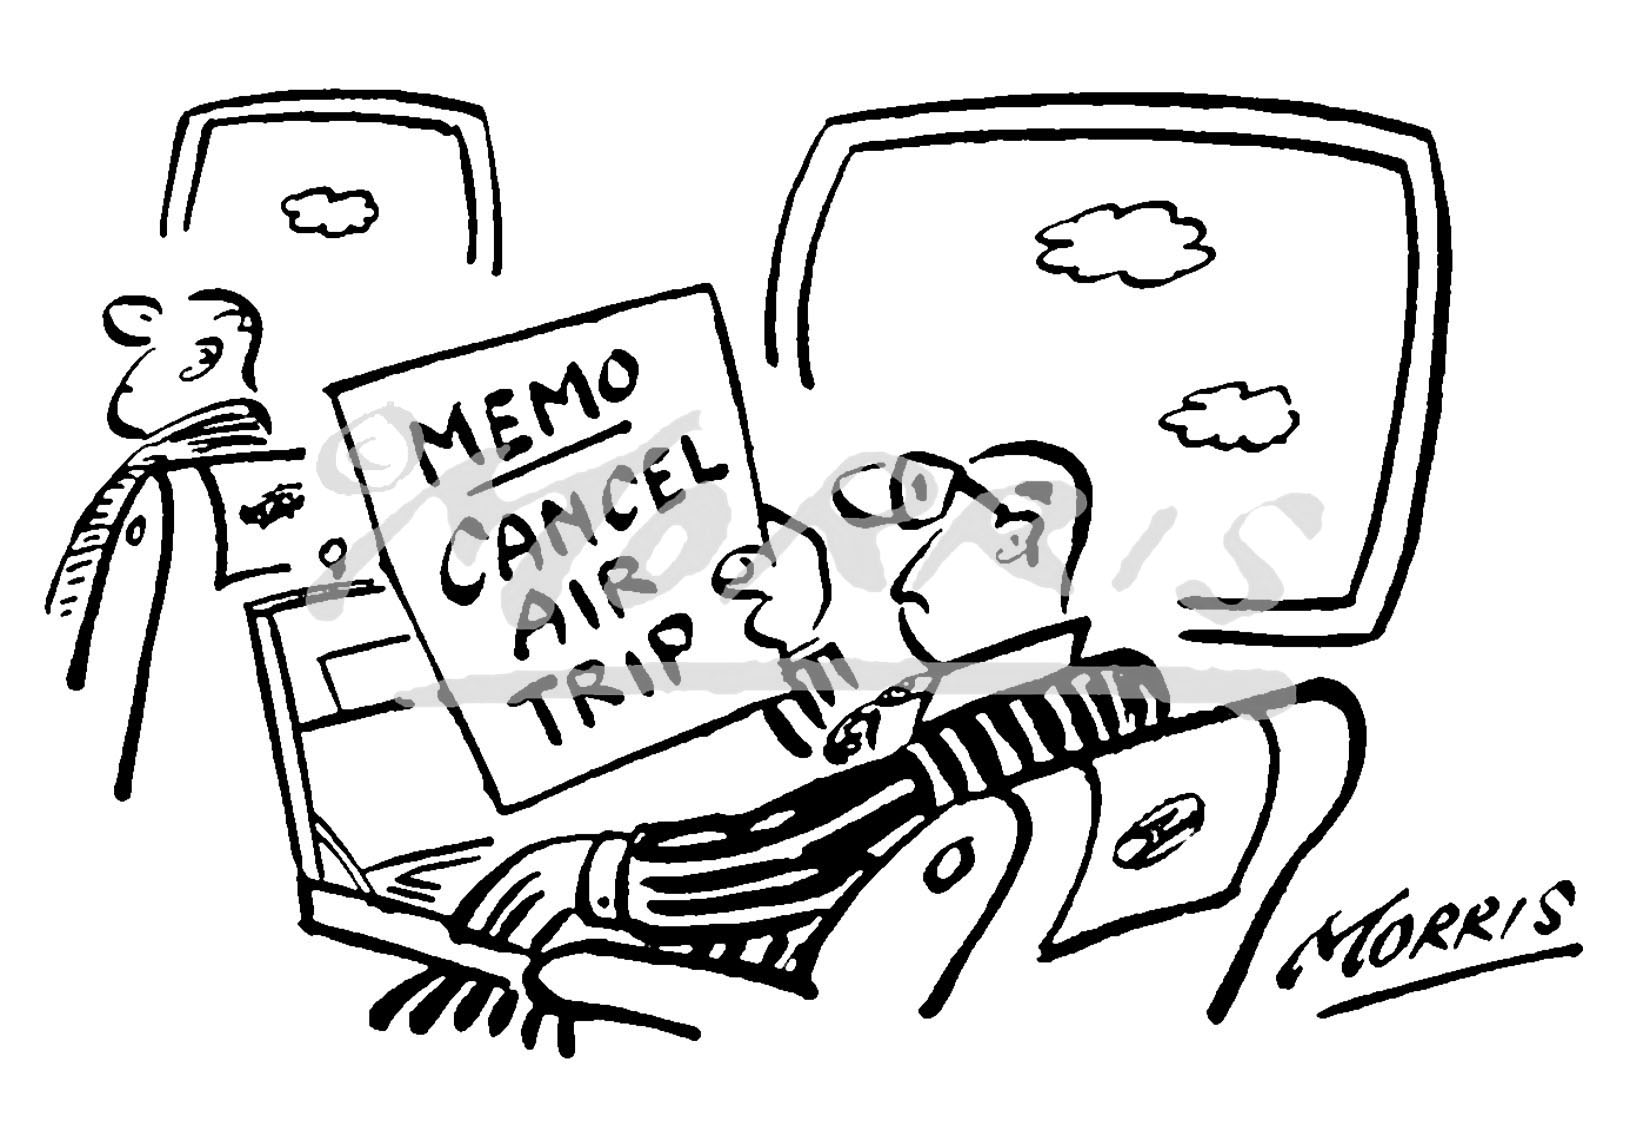 Manager cartoon – Ref: 0246bw